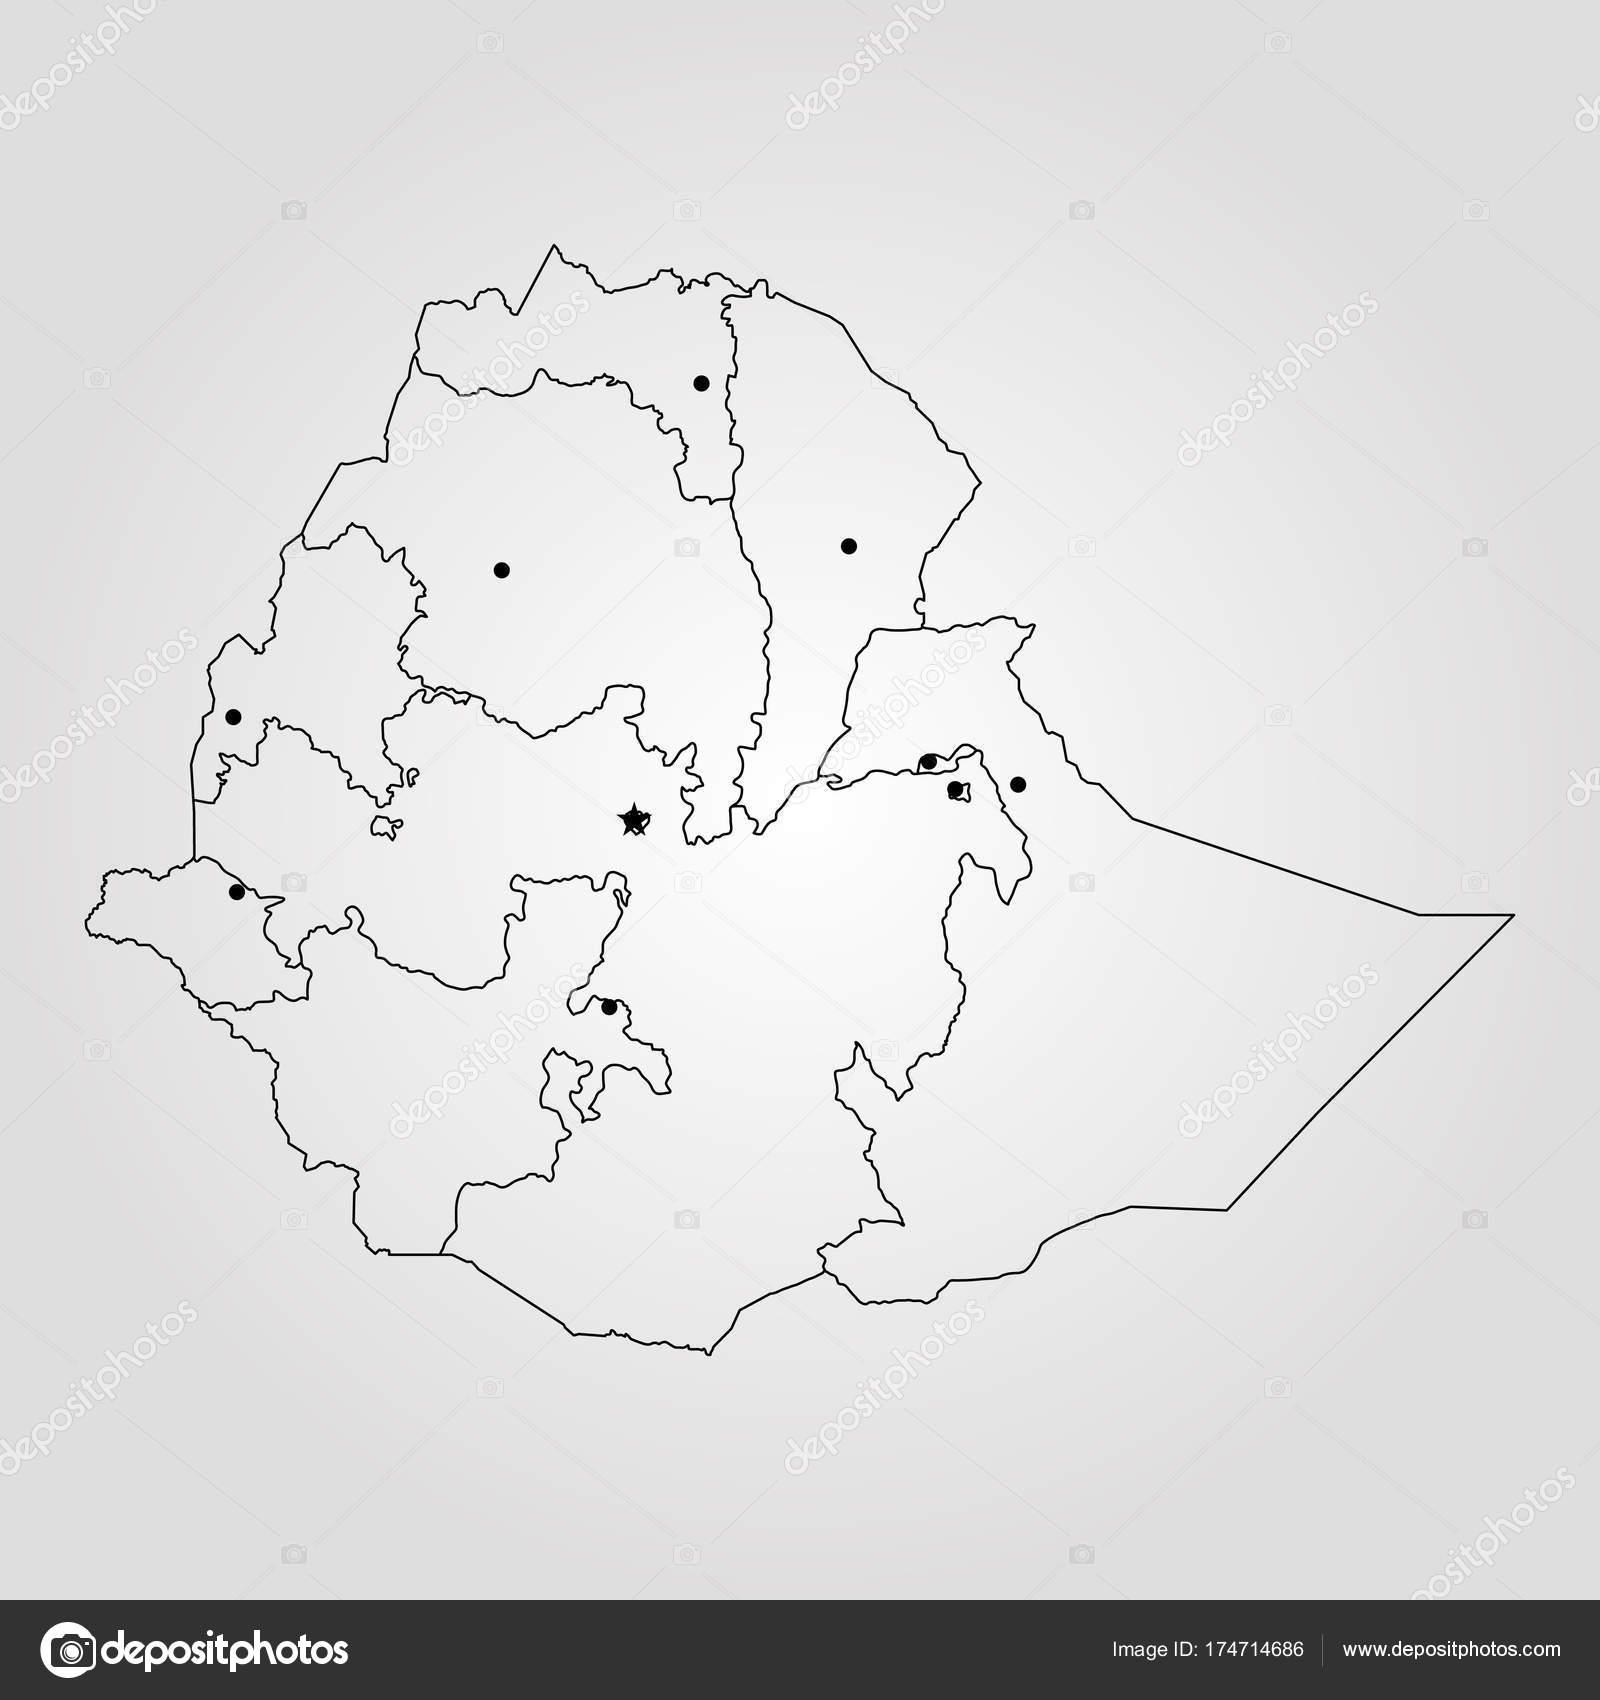 Map of ethiopia stock vector uglegorets 174714686 map of ethiopia vector illustration world map vector by uglegorets gumiabroncs Choice Image